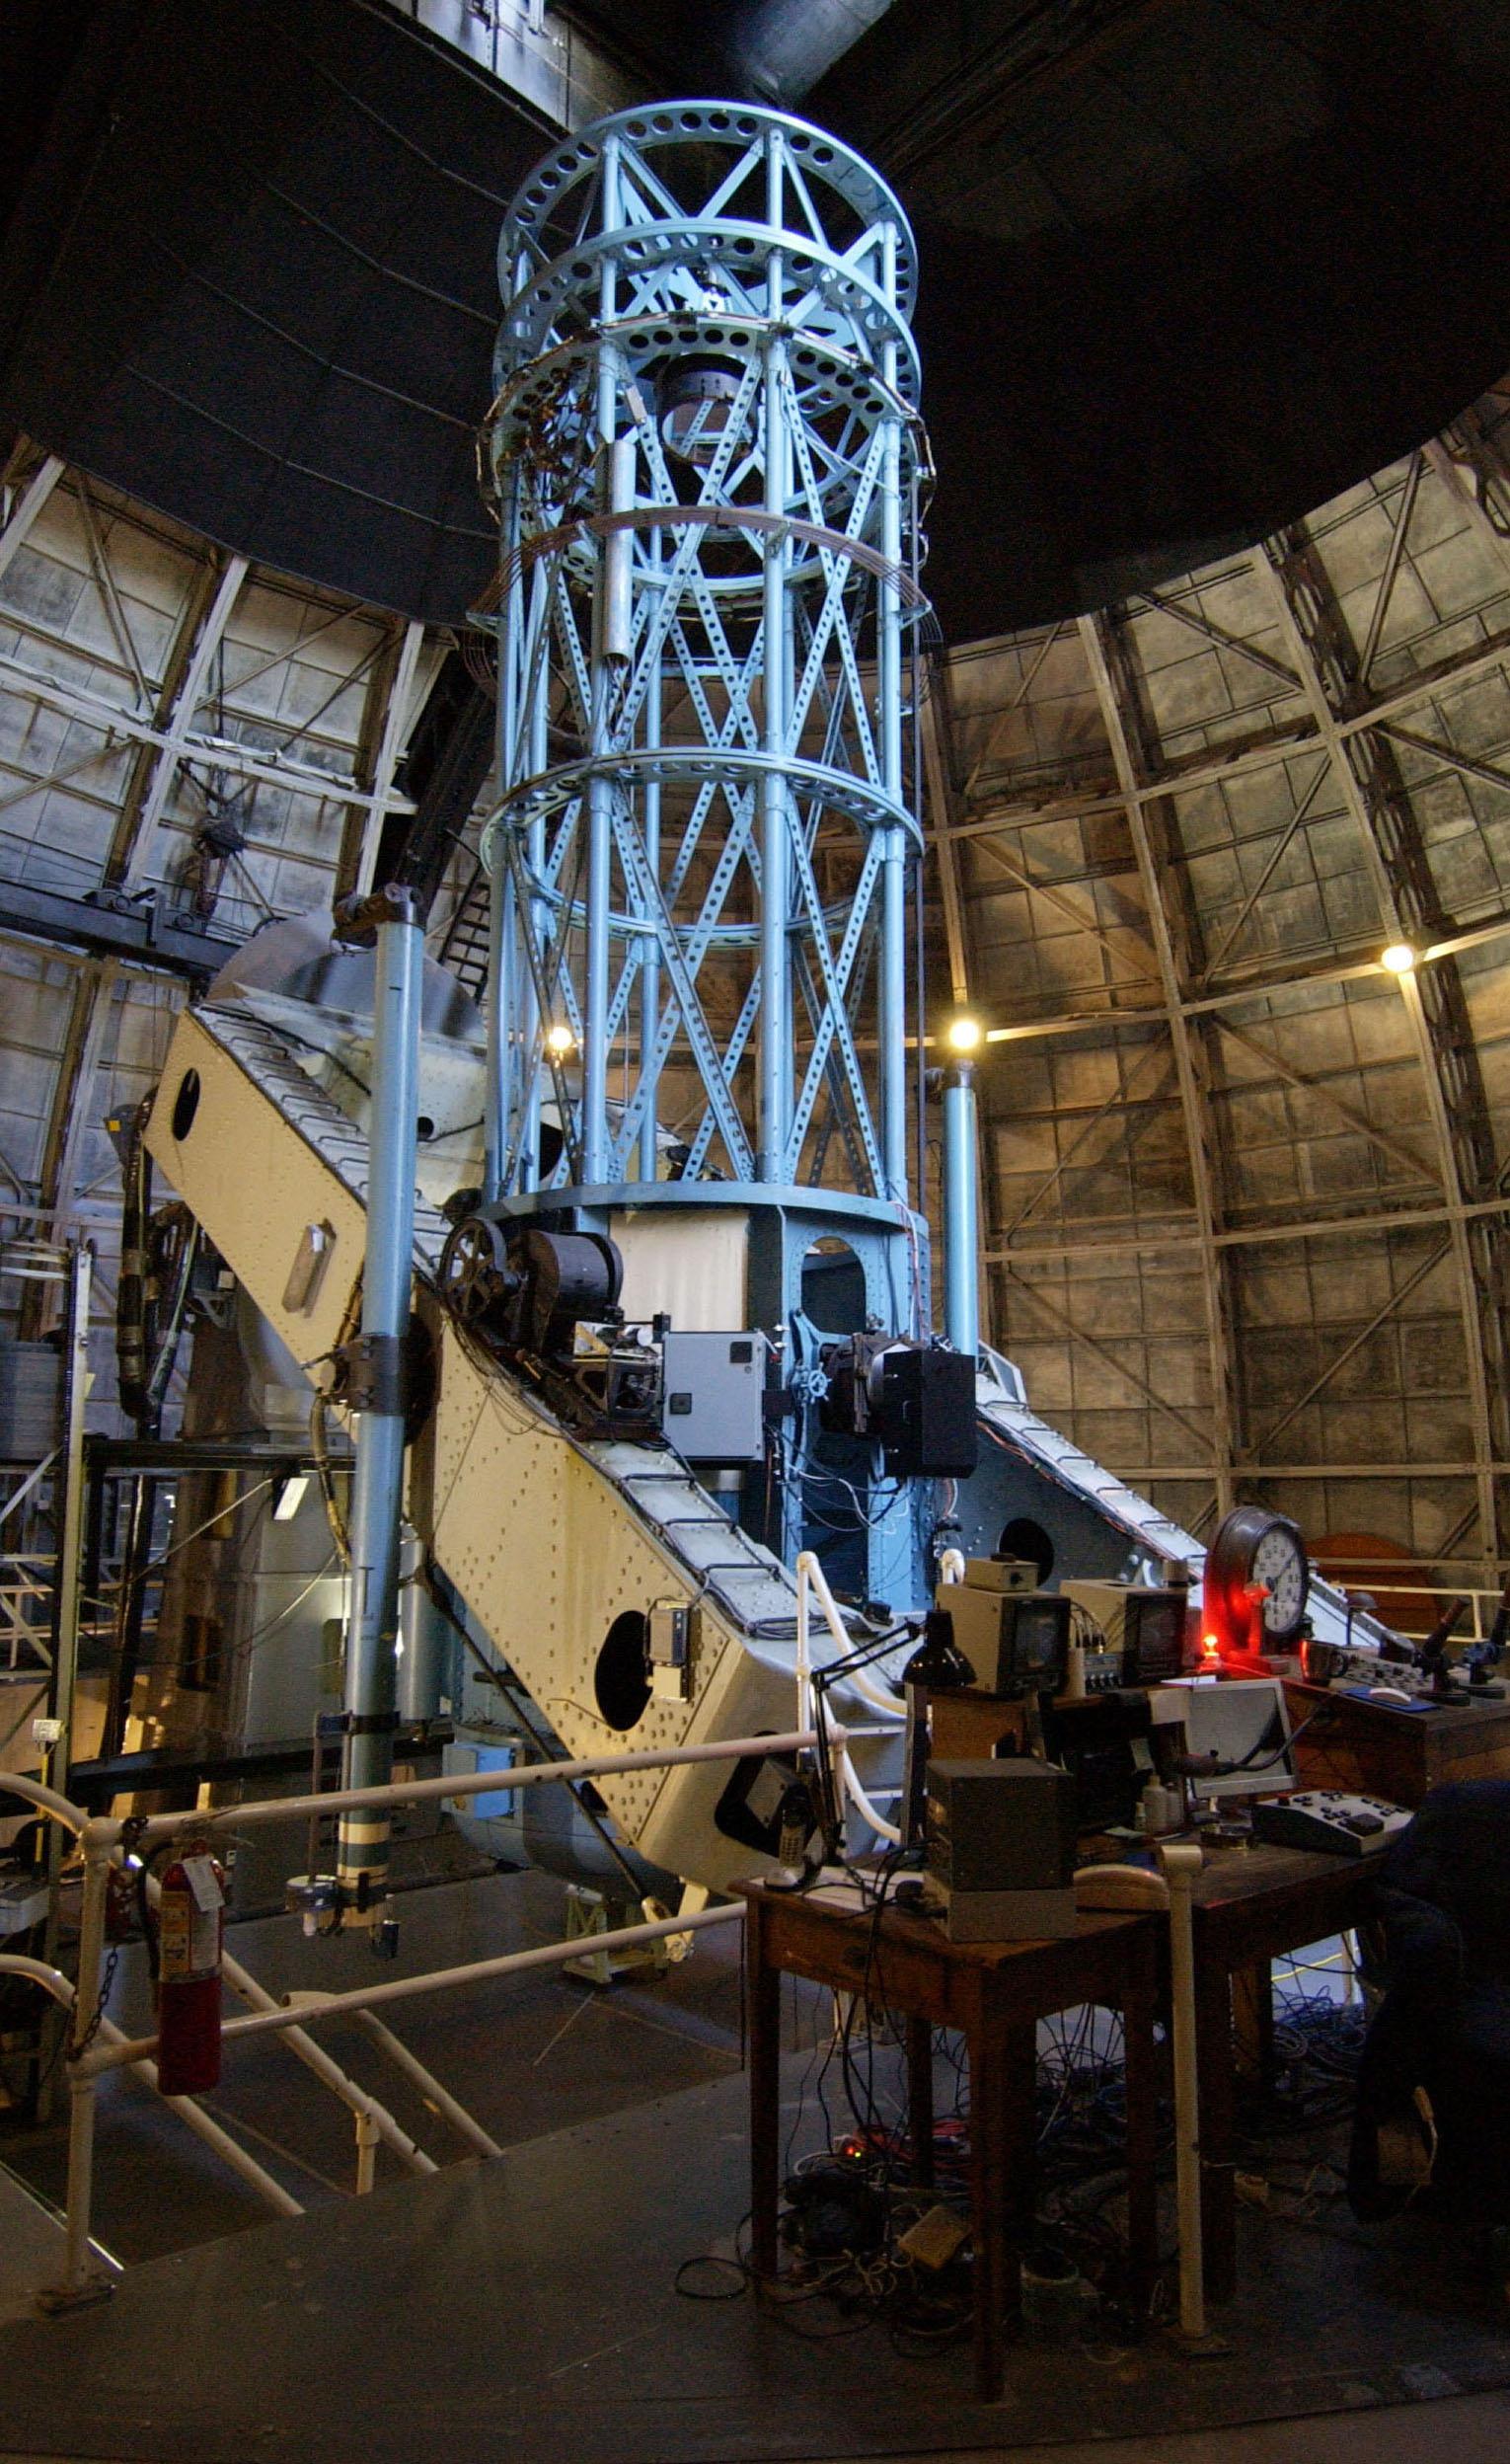 Telescópio Hooker do Observatório Mount Wilson, Califórnia.